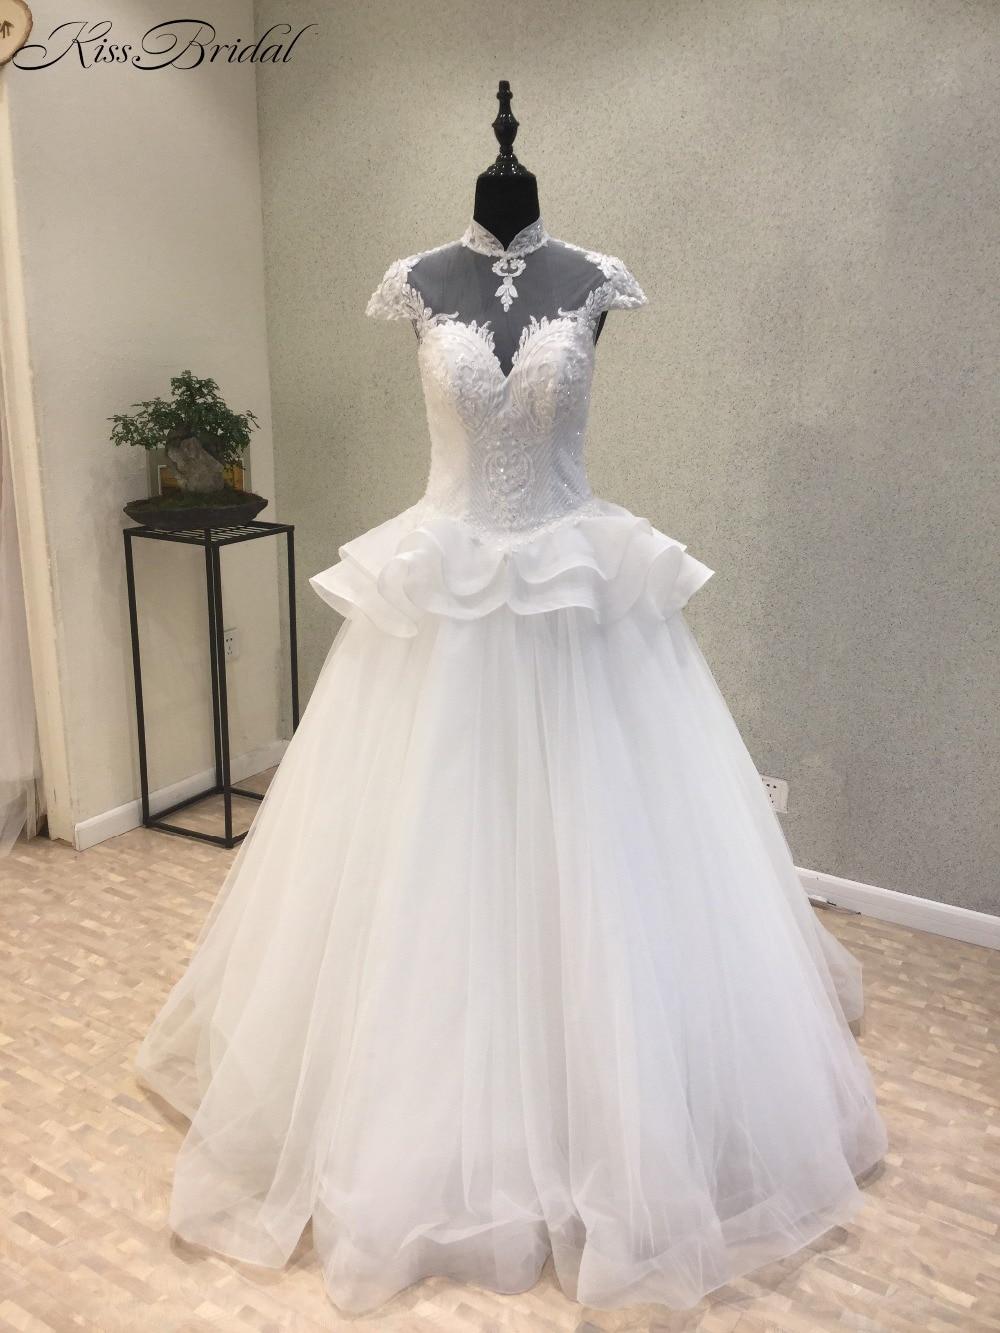 Vestido de casamento New Elegant Wedding Dresses 2020 High Neck Short Sleeves Ball Gown Bride Dresses Lace Up Back mariage